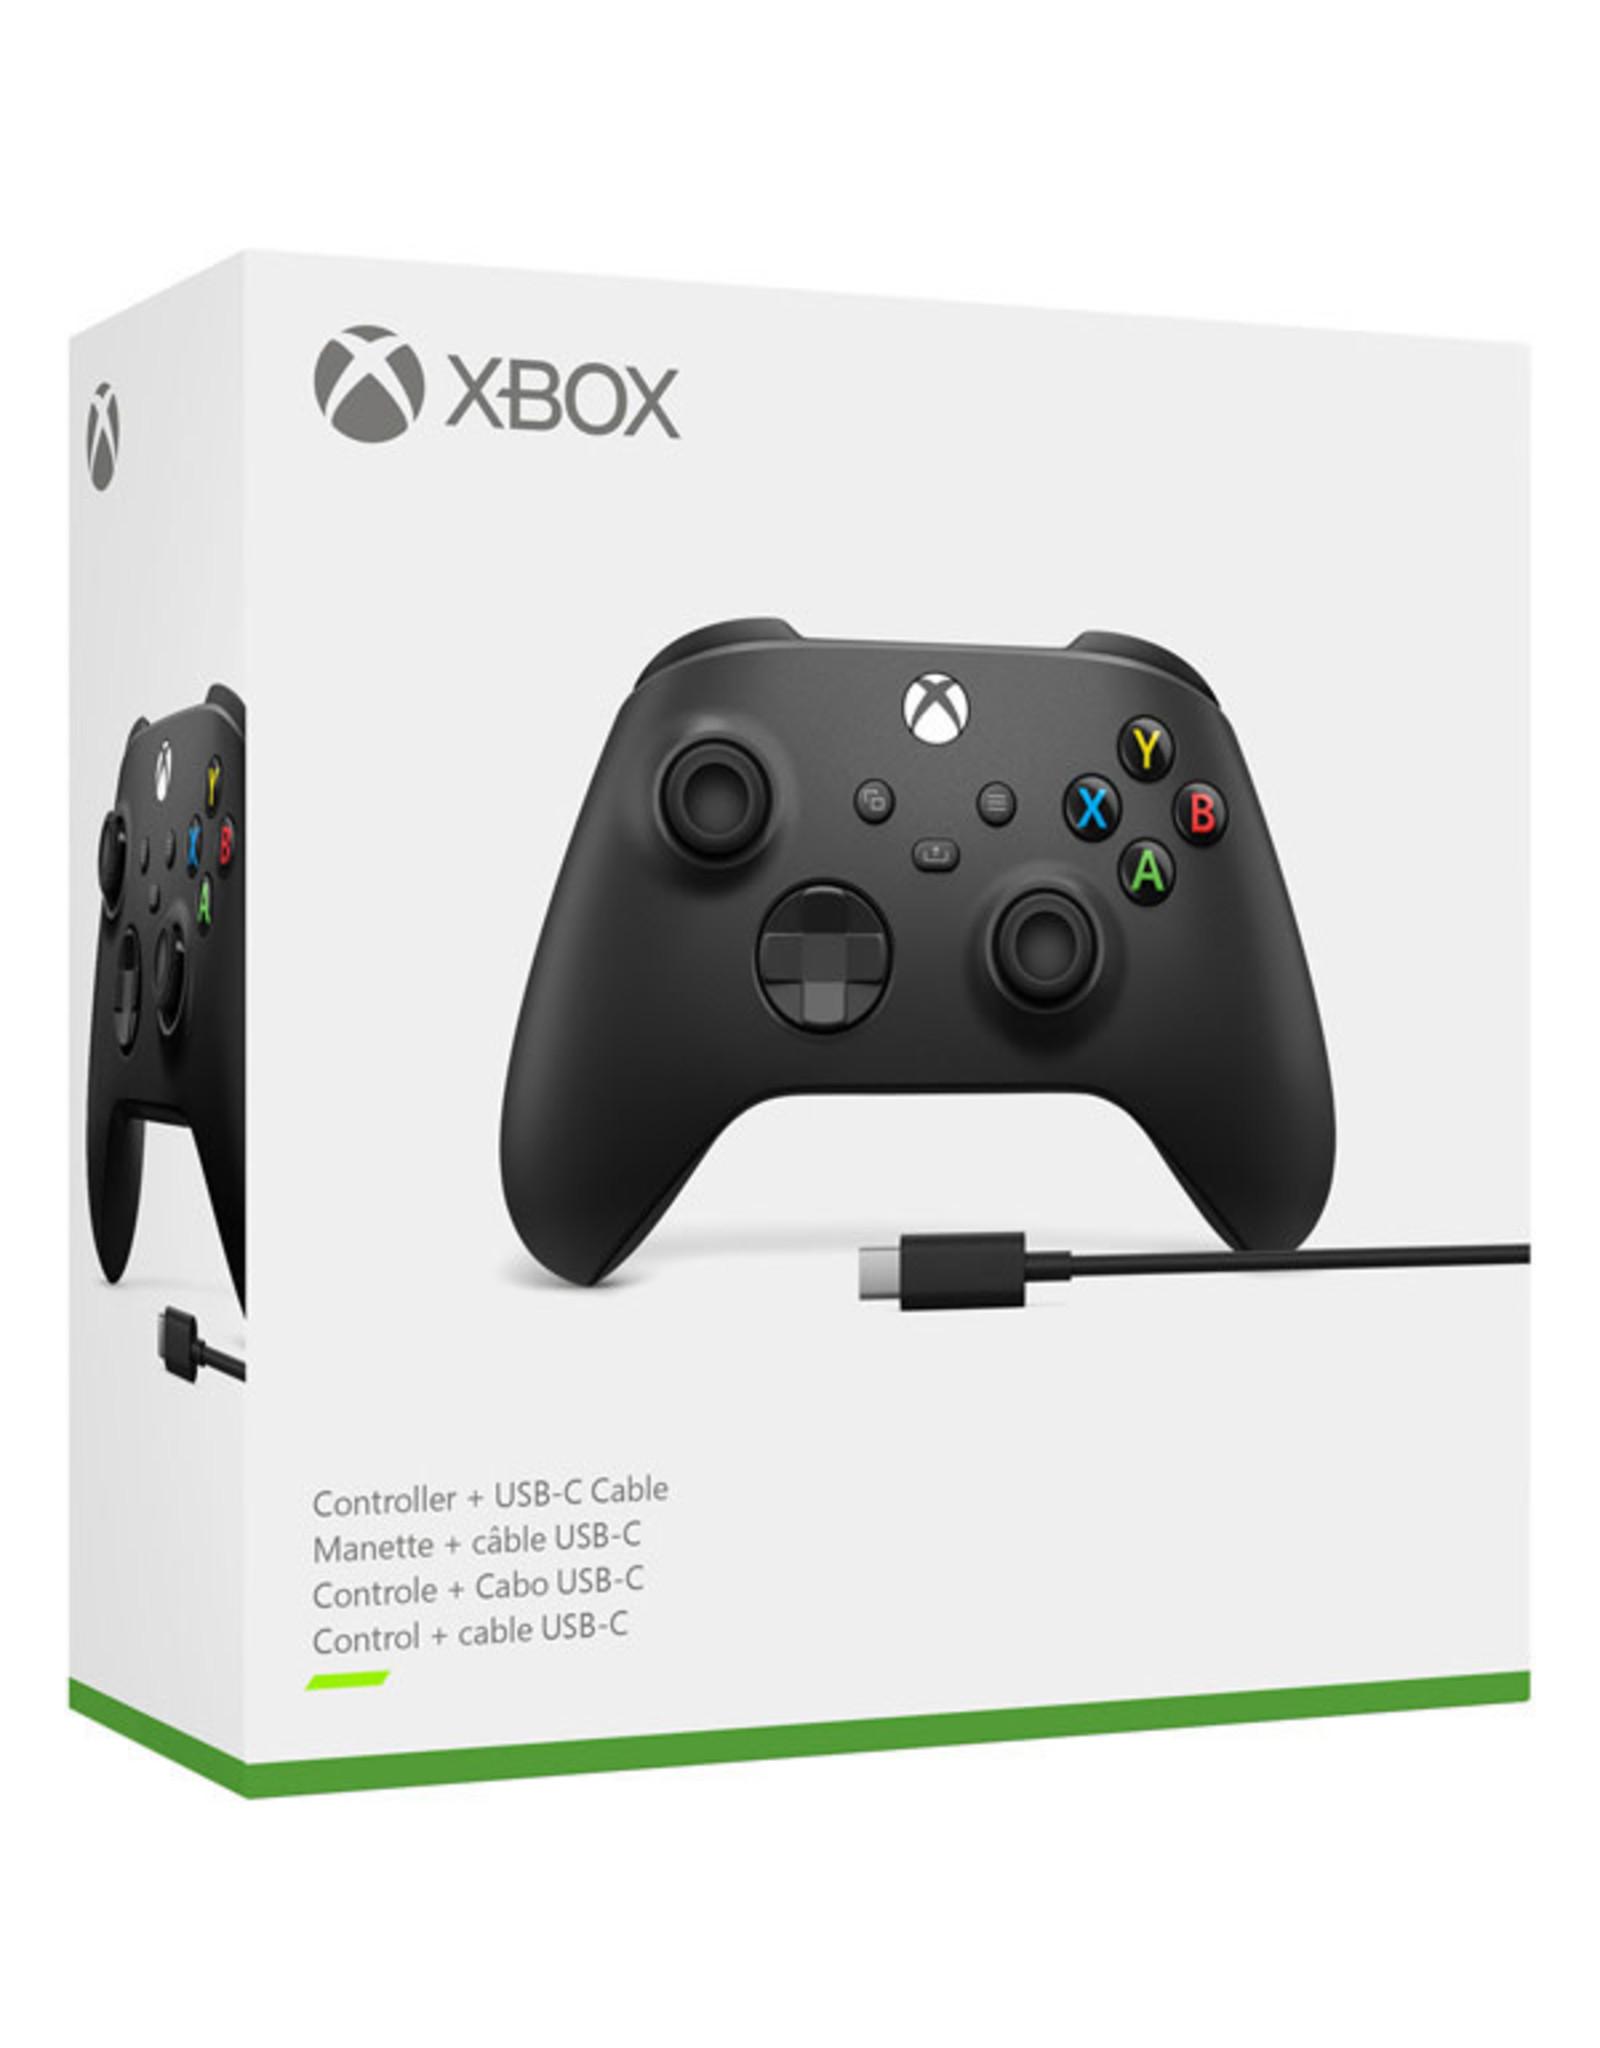 Microsoft Microsoft - Xbox Series X/S wireless Controller w/ 9 USB Cable